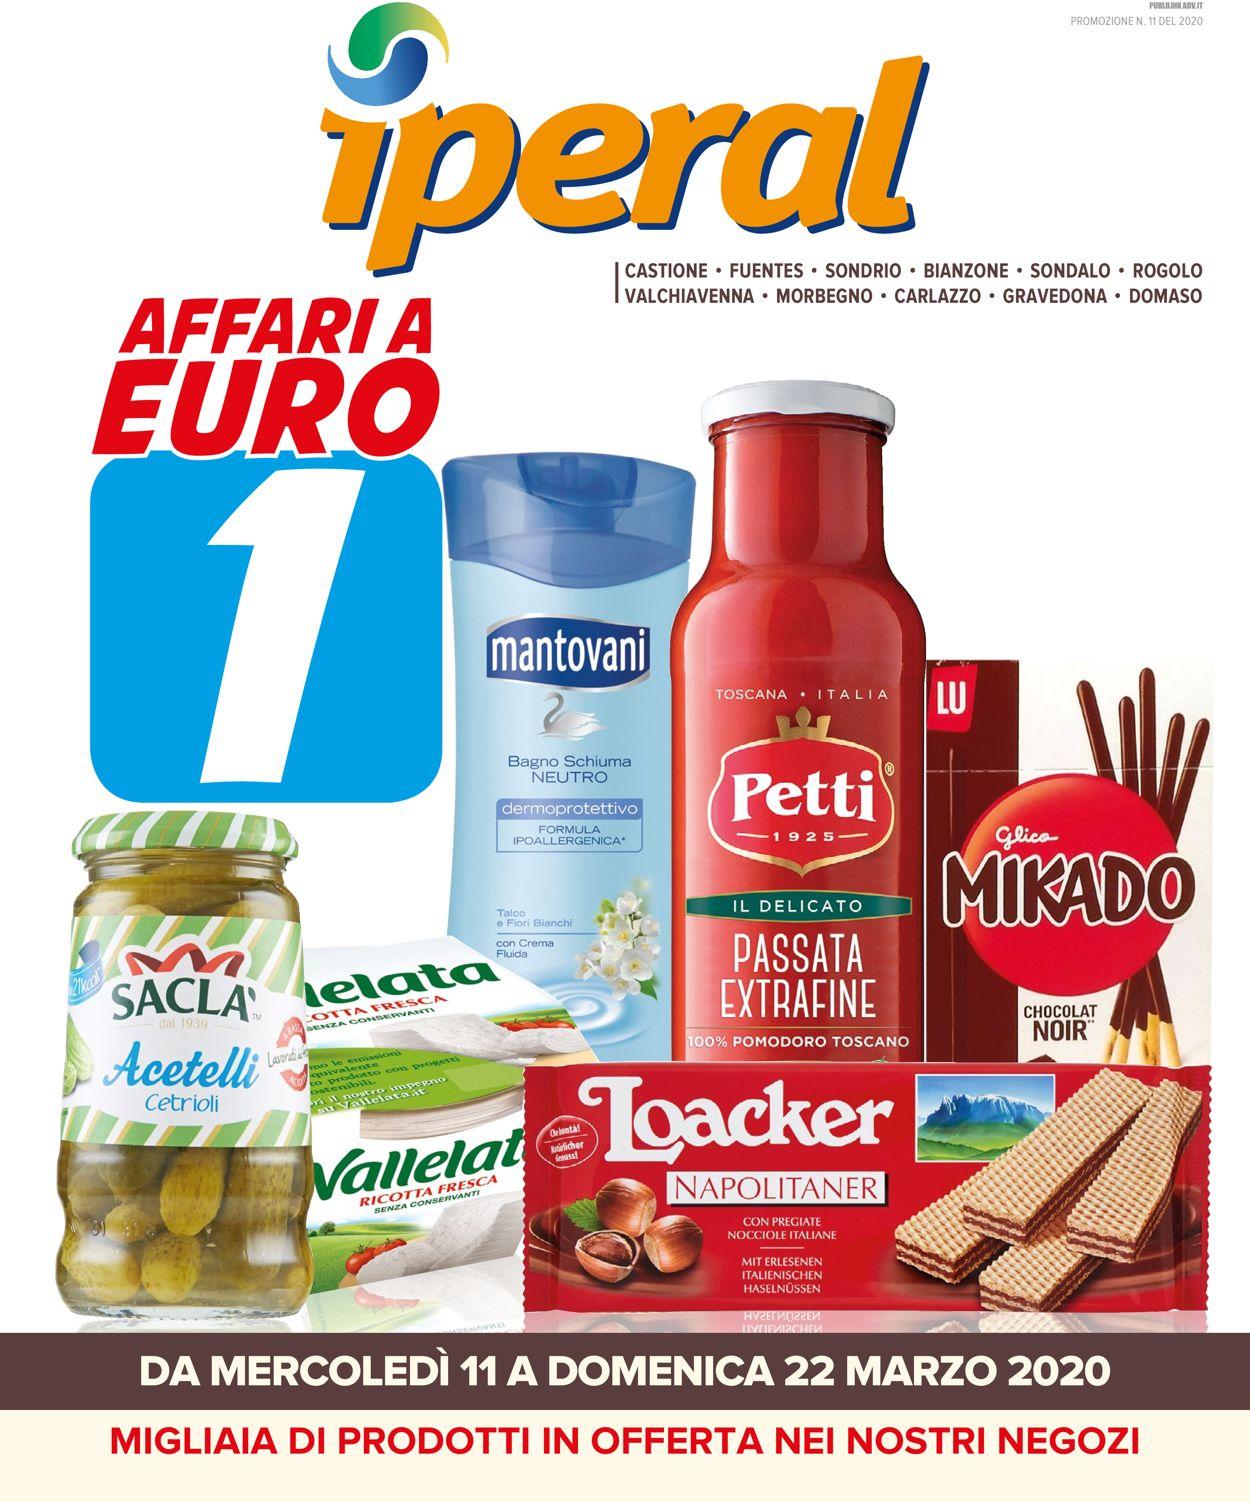 Volantino Iperal - Offerte 11/03-22/03/2020